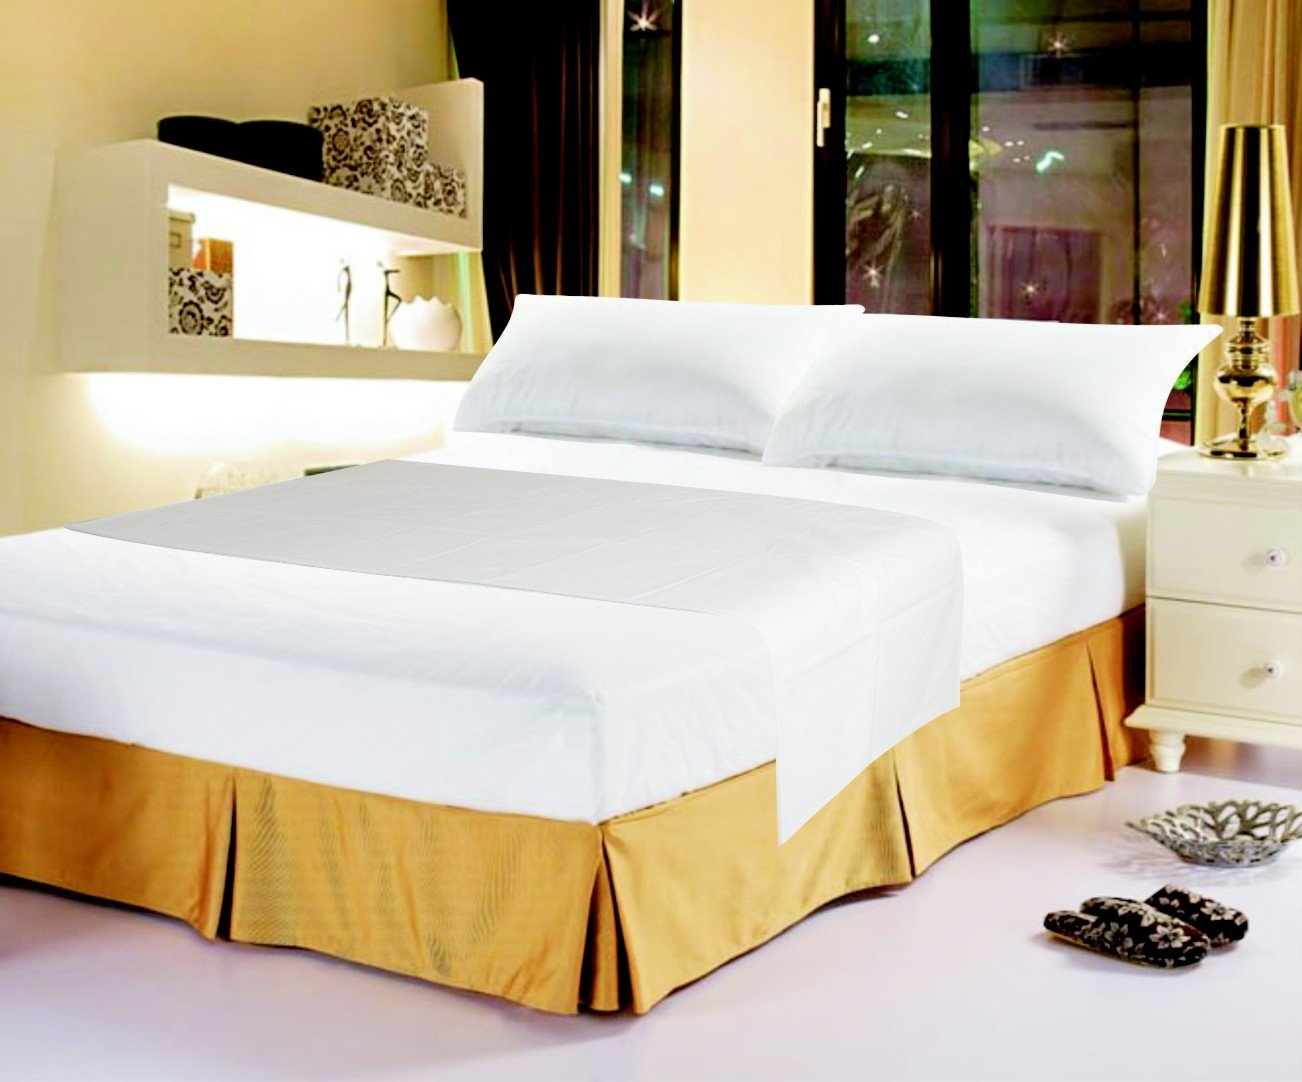 DaDa Bedding FS-098765 3-Piece Cotton Fitted Sheet Set, King, White